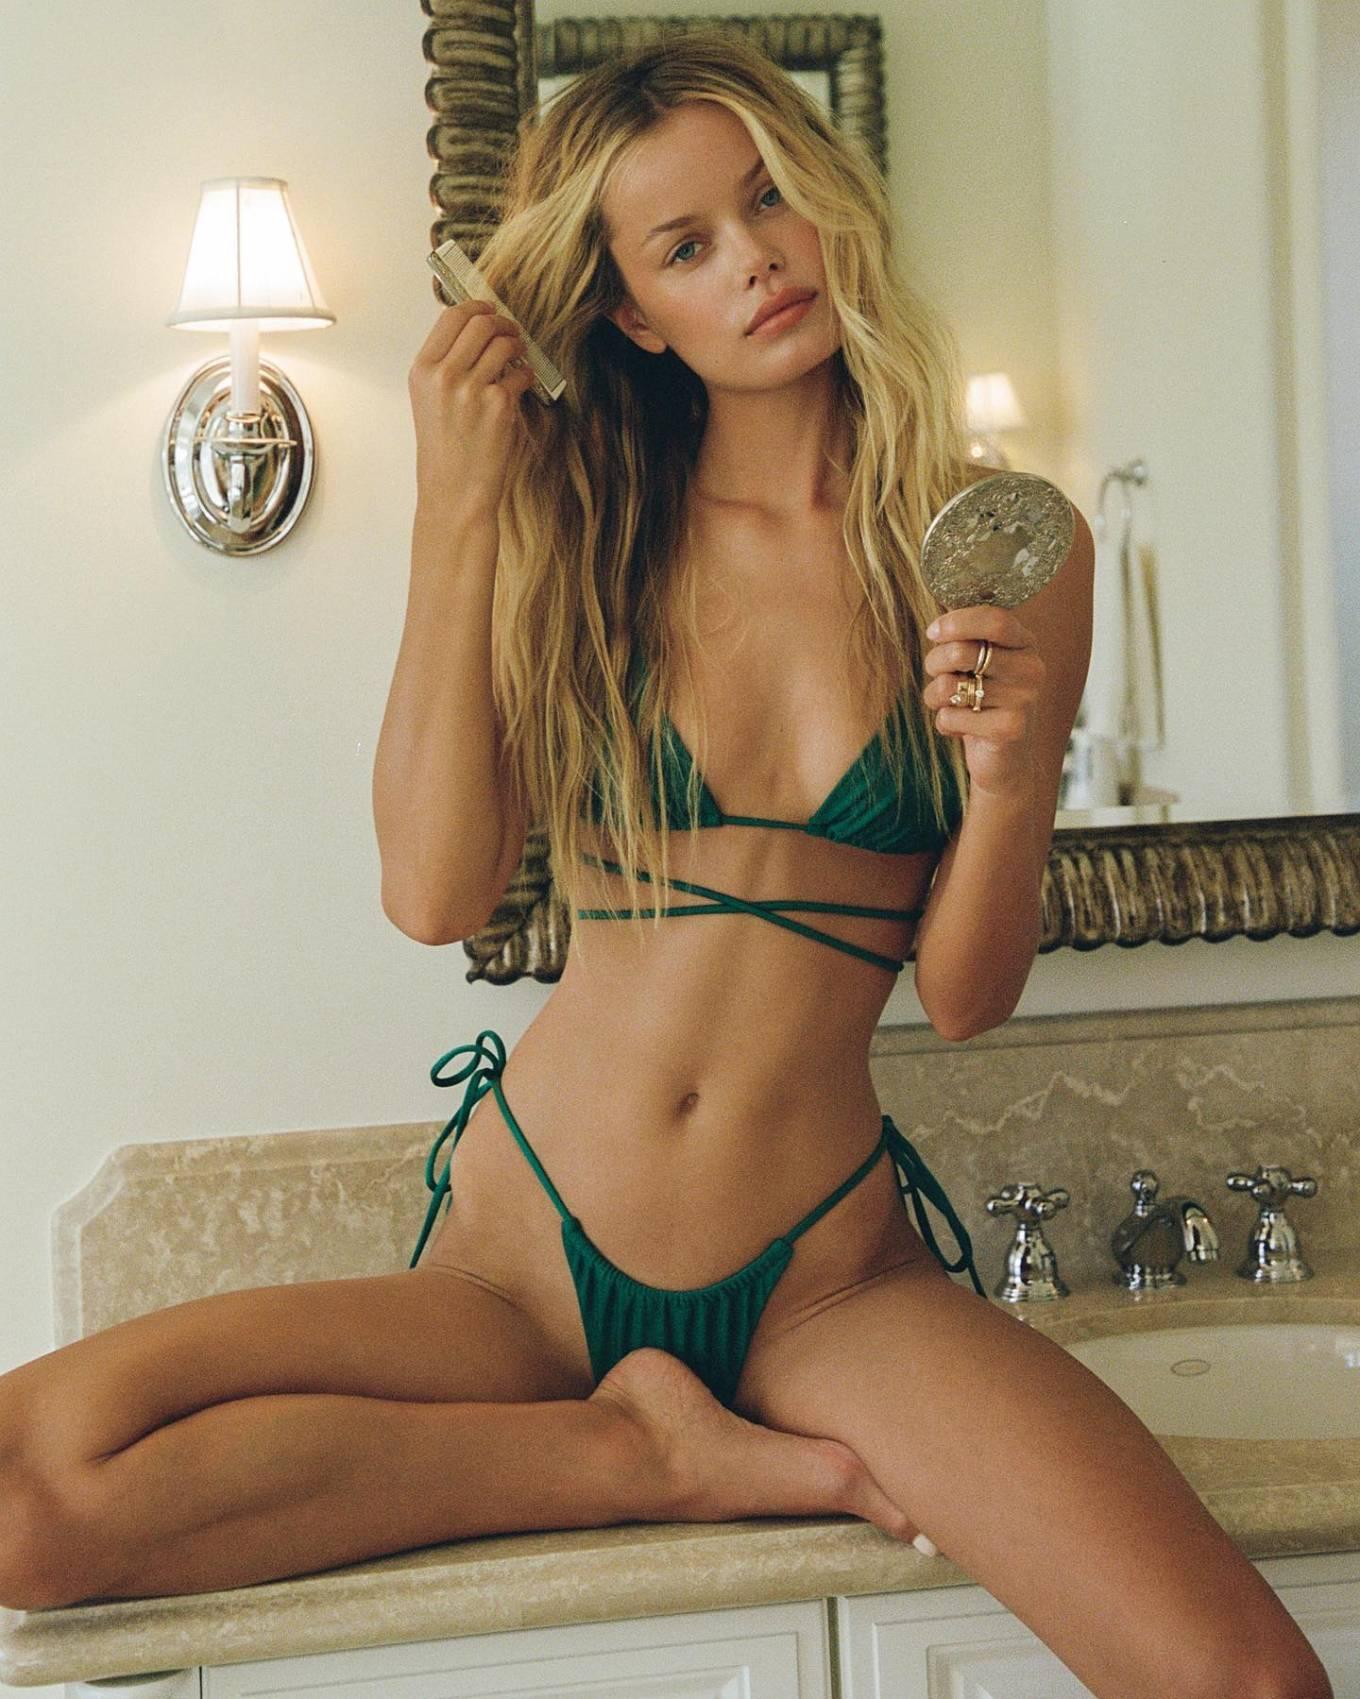 Frida Aasen donning skimpy emerald green ruched bikini bottom with tied waist